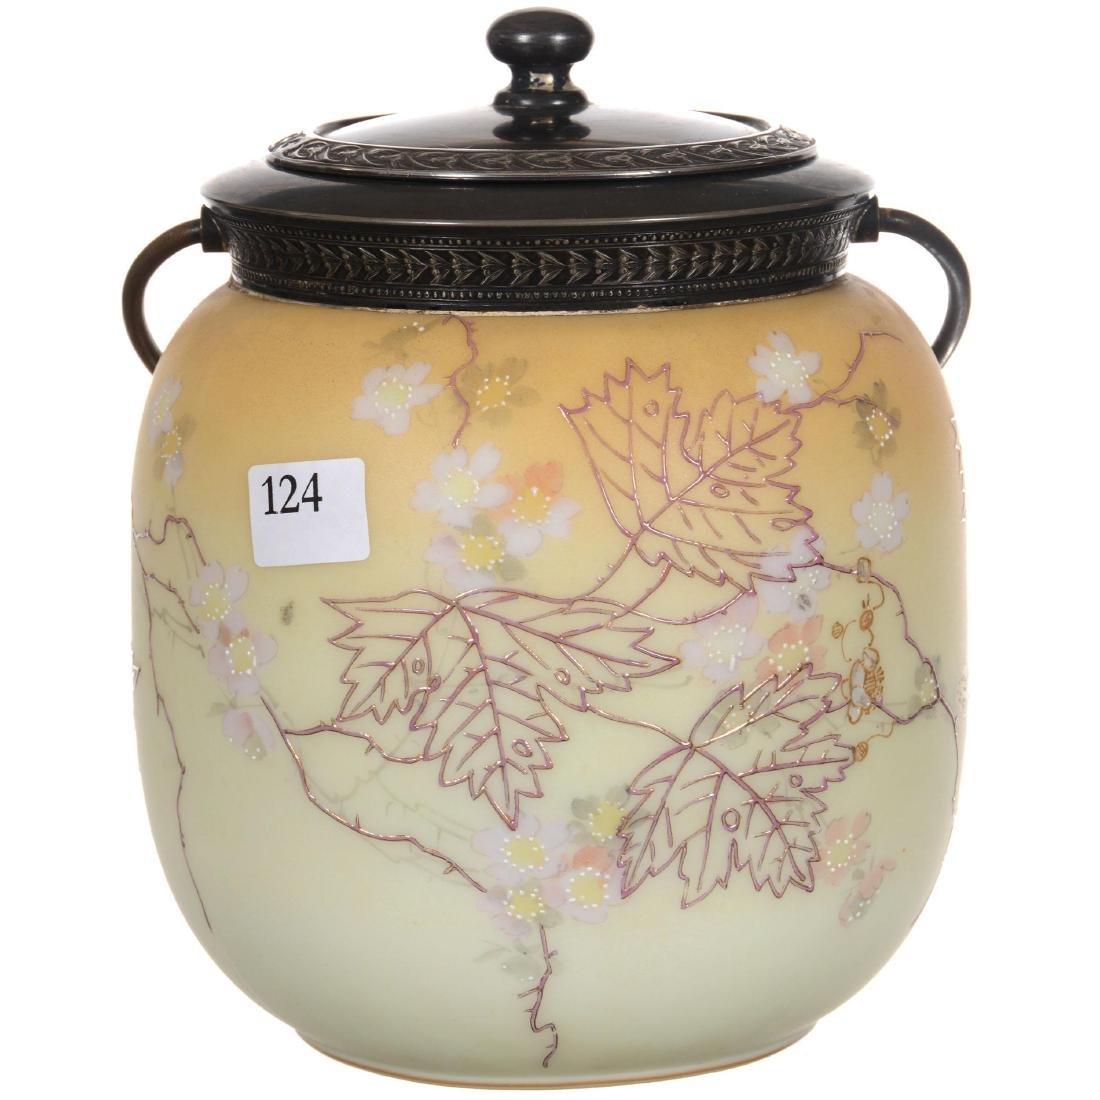 Marked Crown Milano Art Glass Biscuit Jar